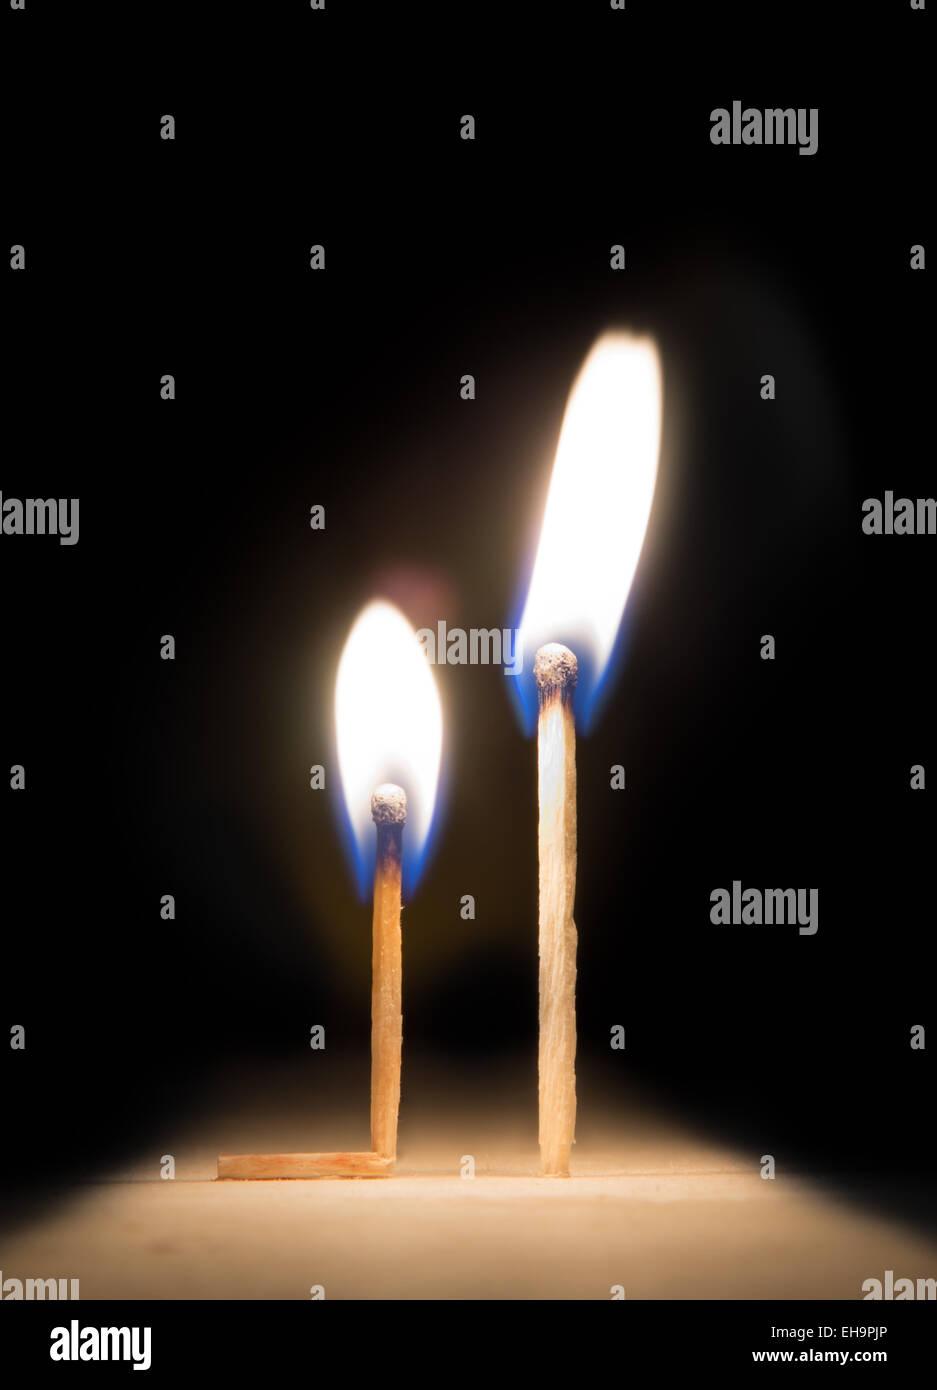 burning match kneeling before match on fire metaphor on black background - Stock Image